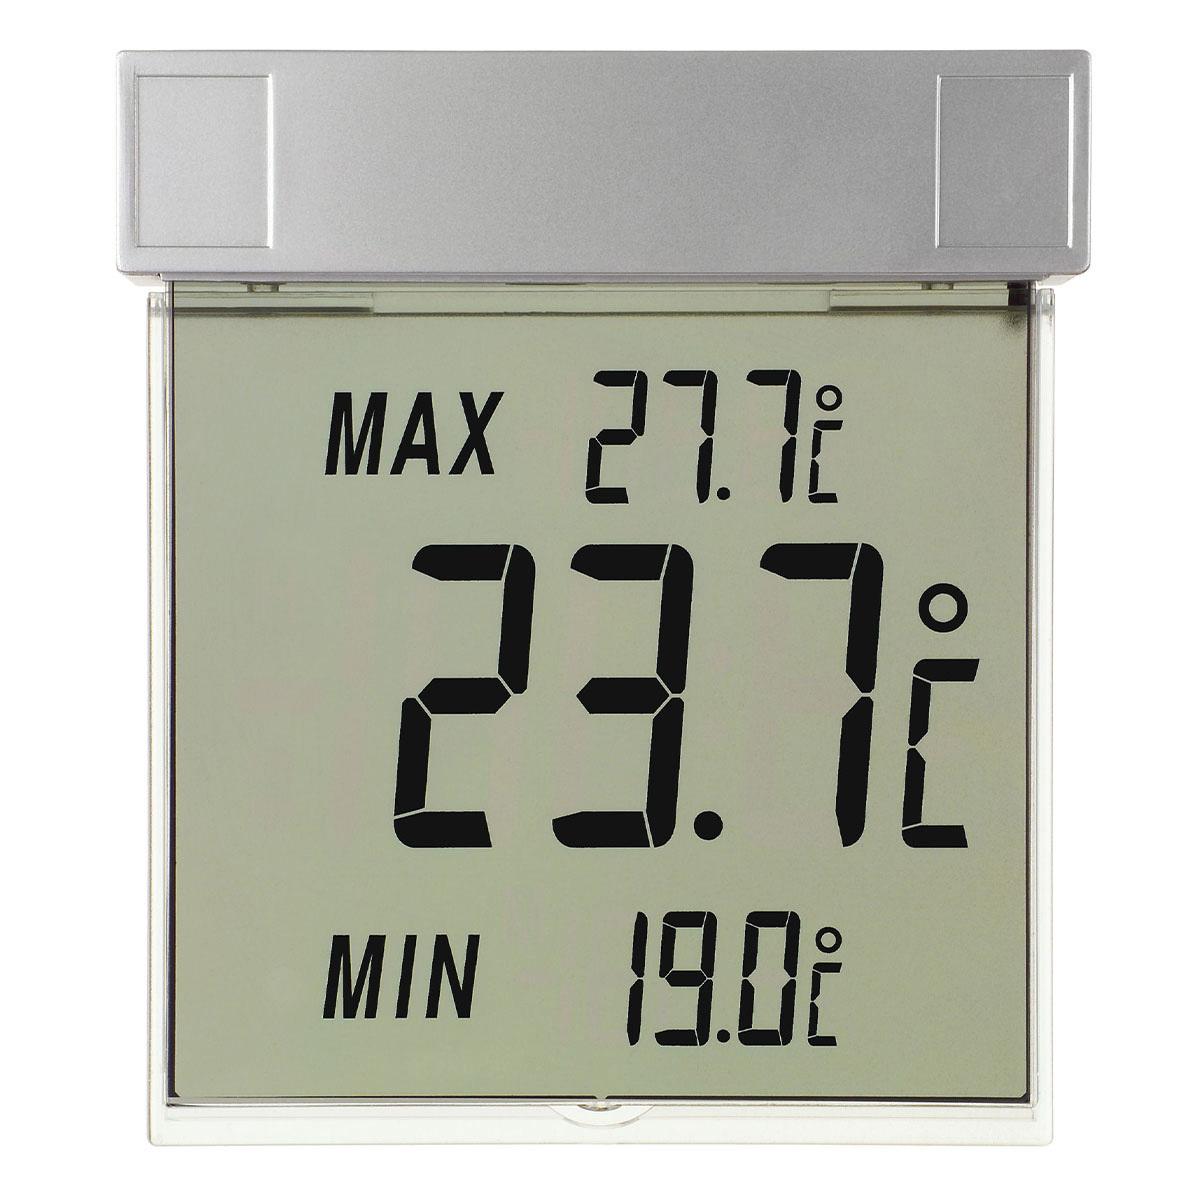 95-2009-tfa-thekendisplay-digitale-thermometer-produkt1-1200x1200px.jpg